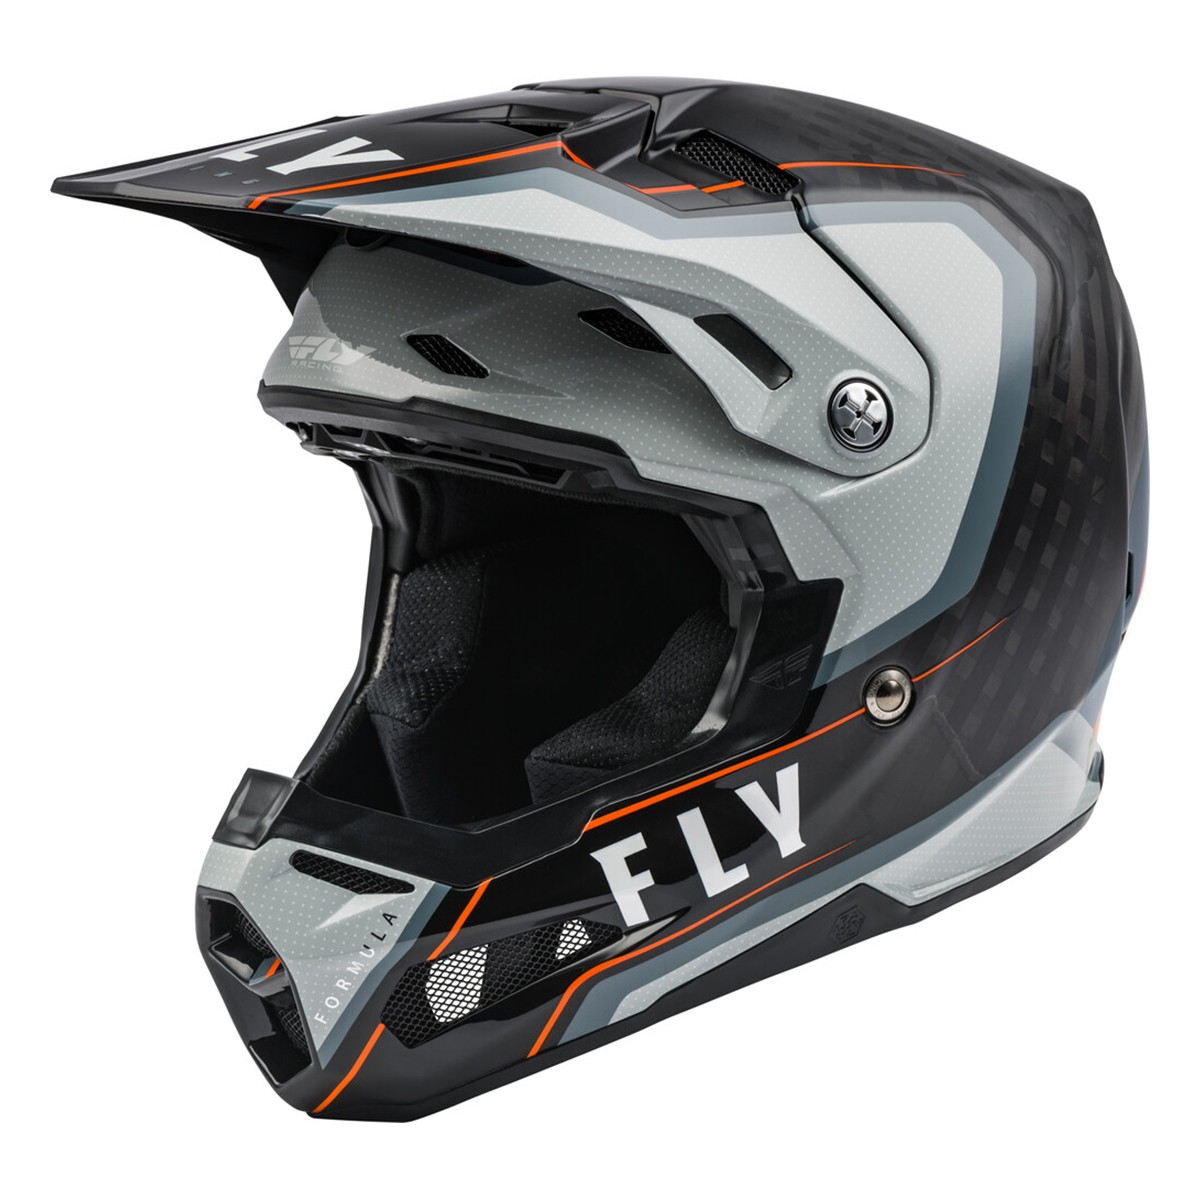 FLY RACING  FORMULA CARBON AXON 2021 HELMET